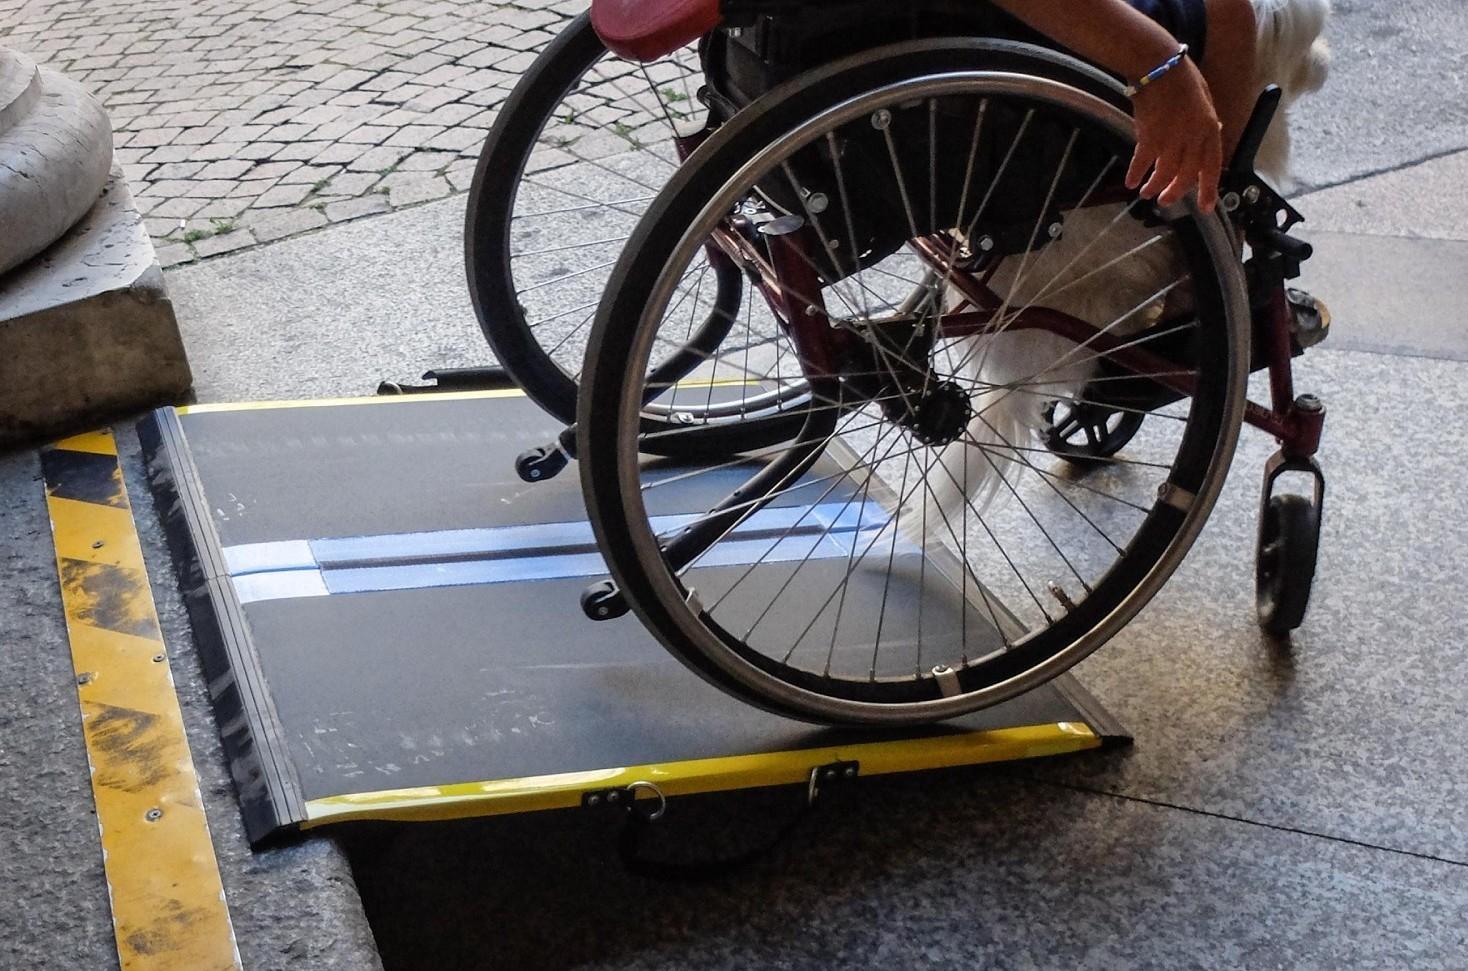 Pensioni disabili 2020, le novità attese